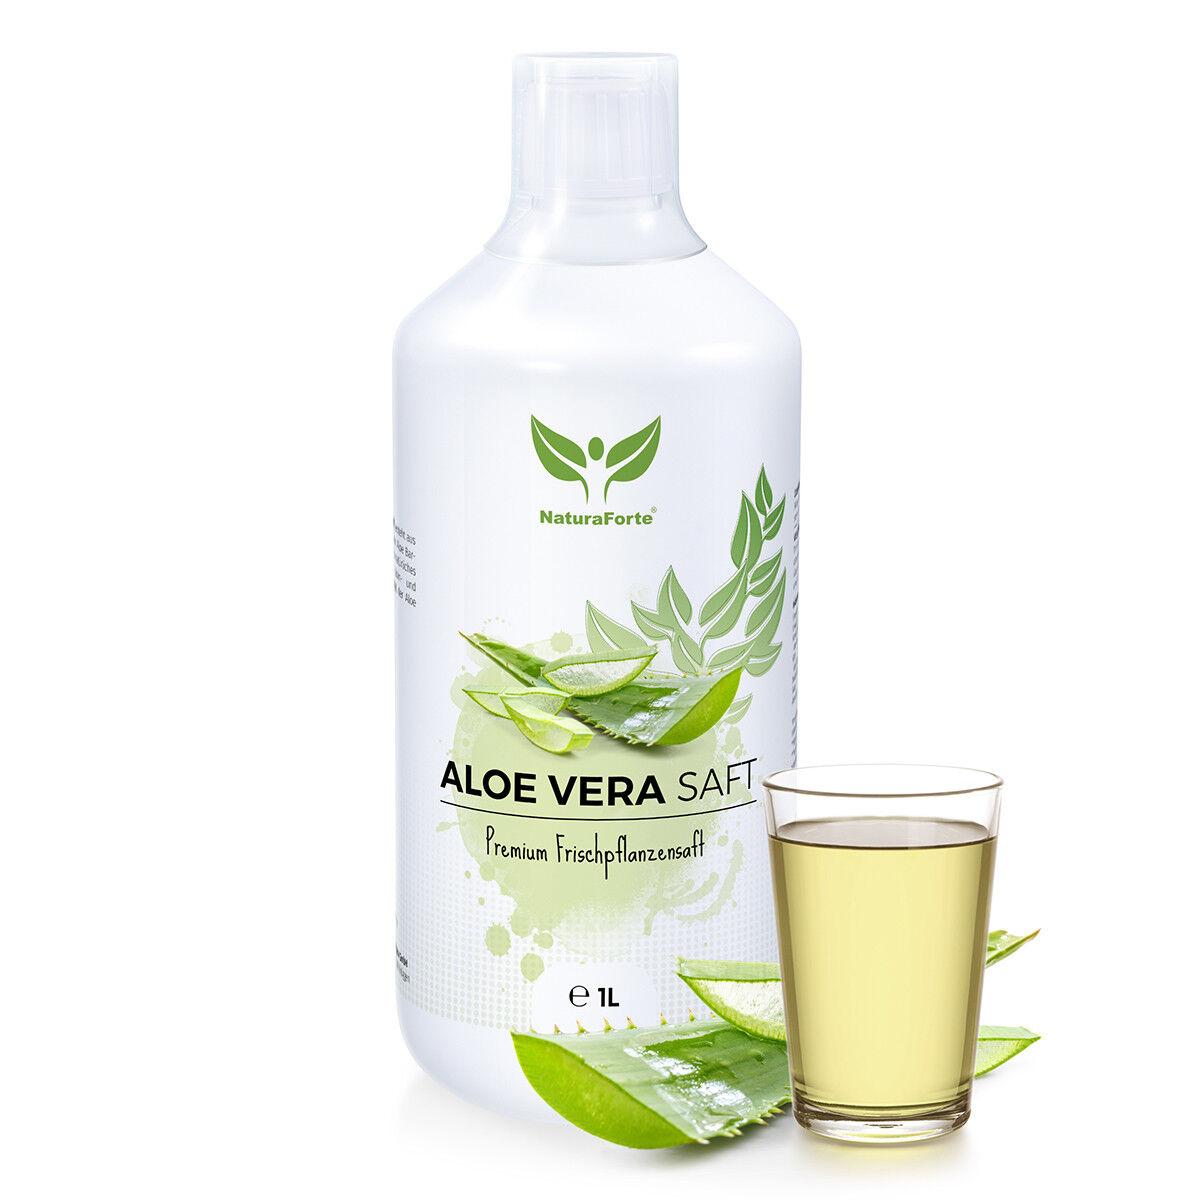 Aloe Vera Saft natur 99,7% AloeVera Direktsaft unverdünnt 1L NaturaForte® vegan